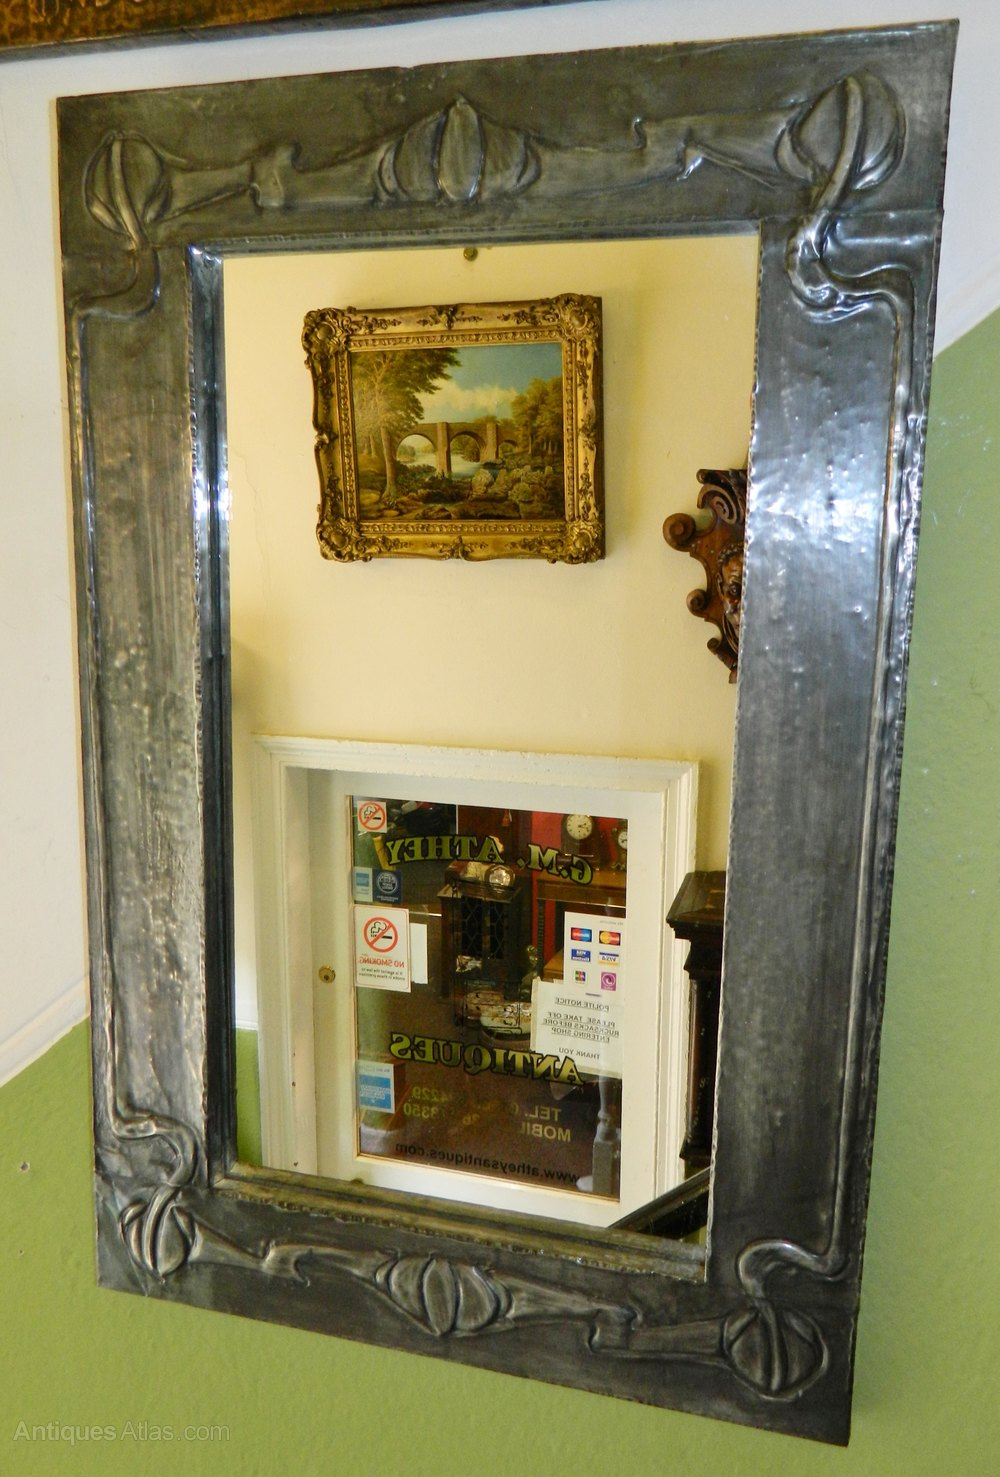 Antiques Atlas - Art Nouveau Pewter Framed Wall Mirror